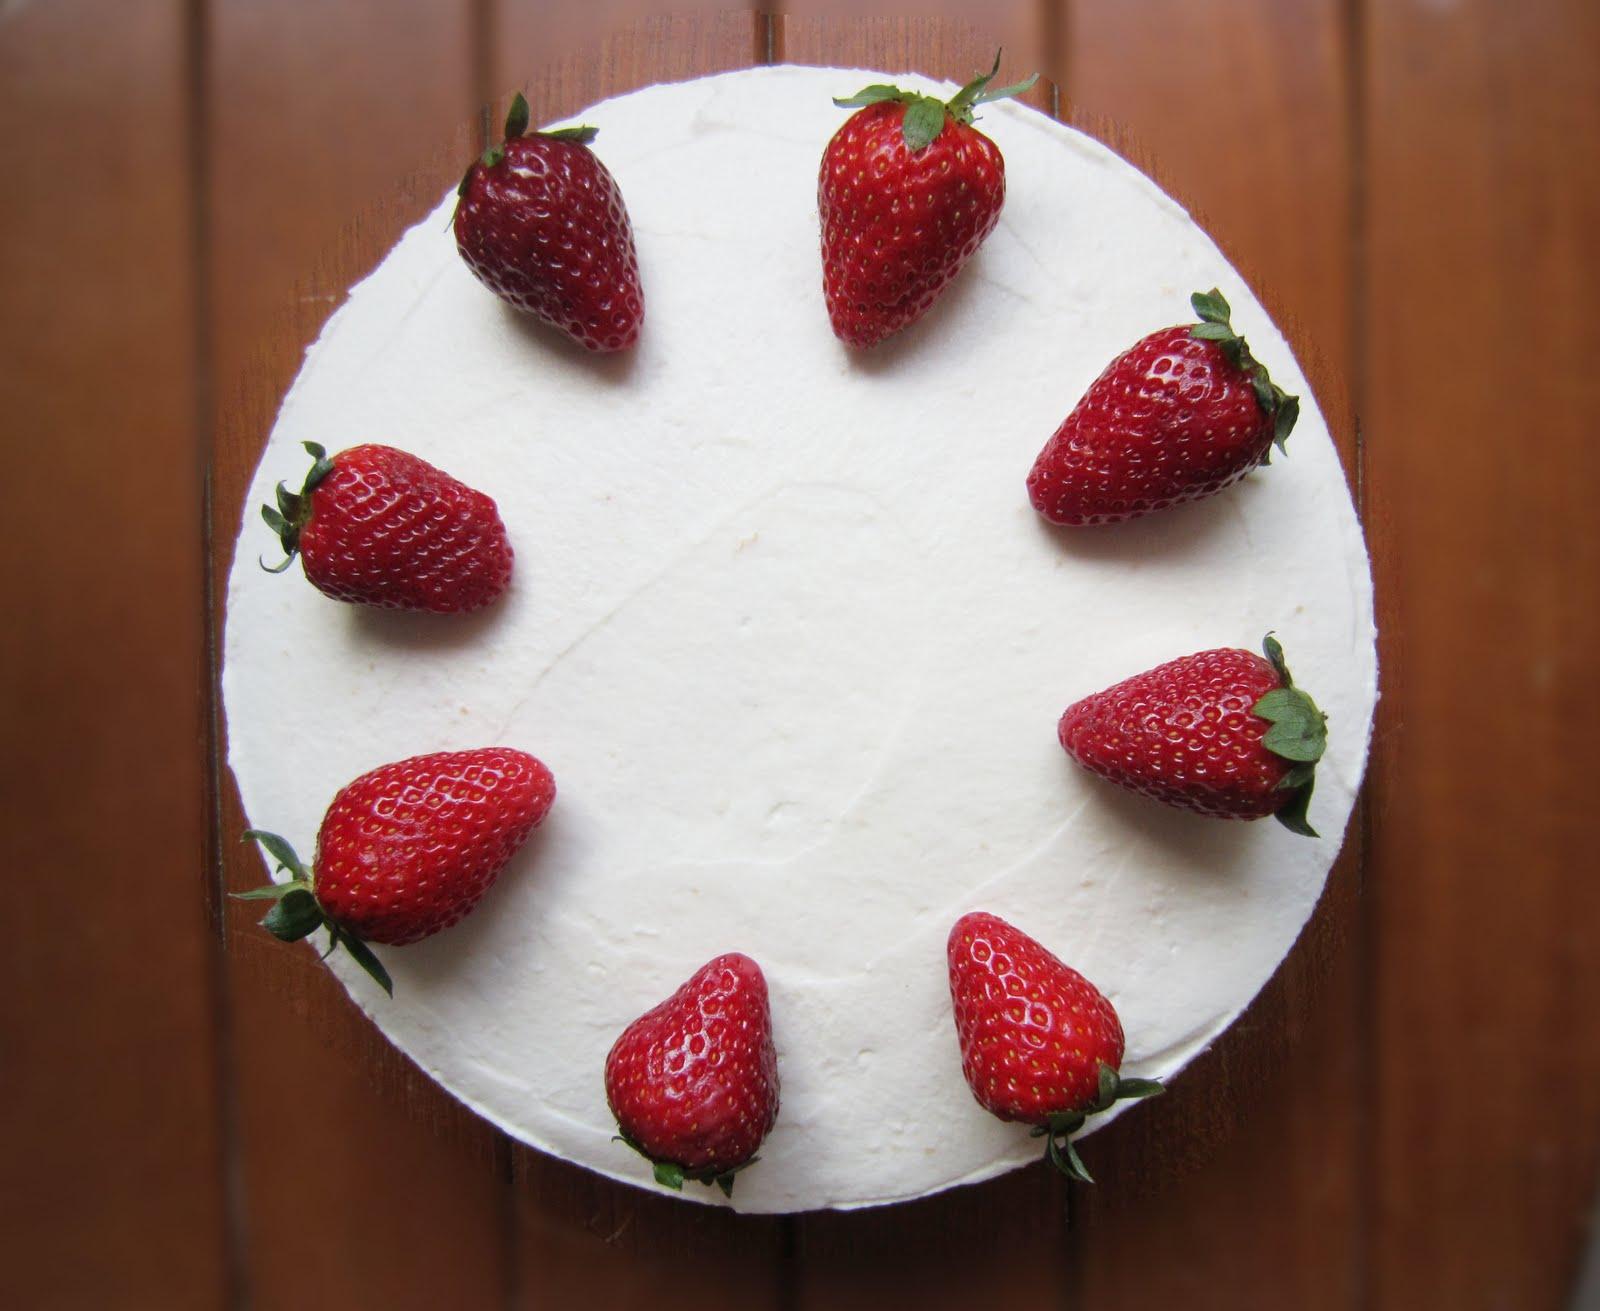 Noms I Must: Strawberry Shortcake II